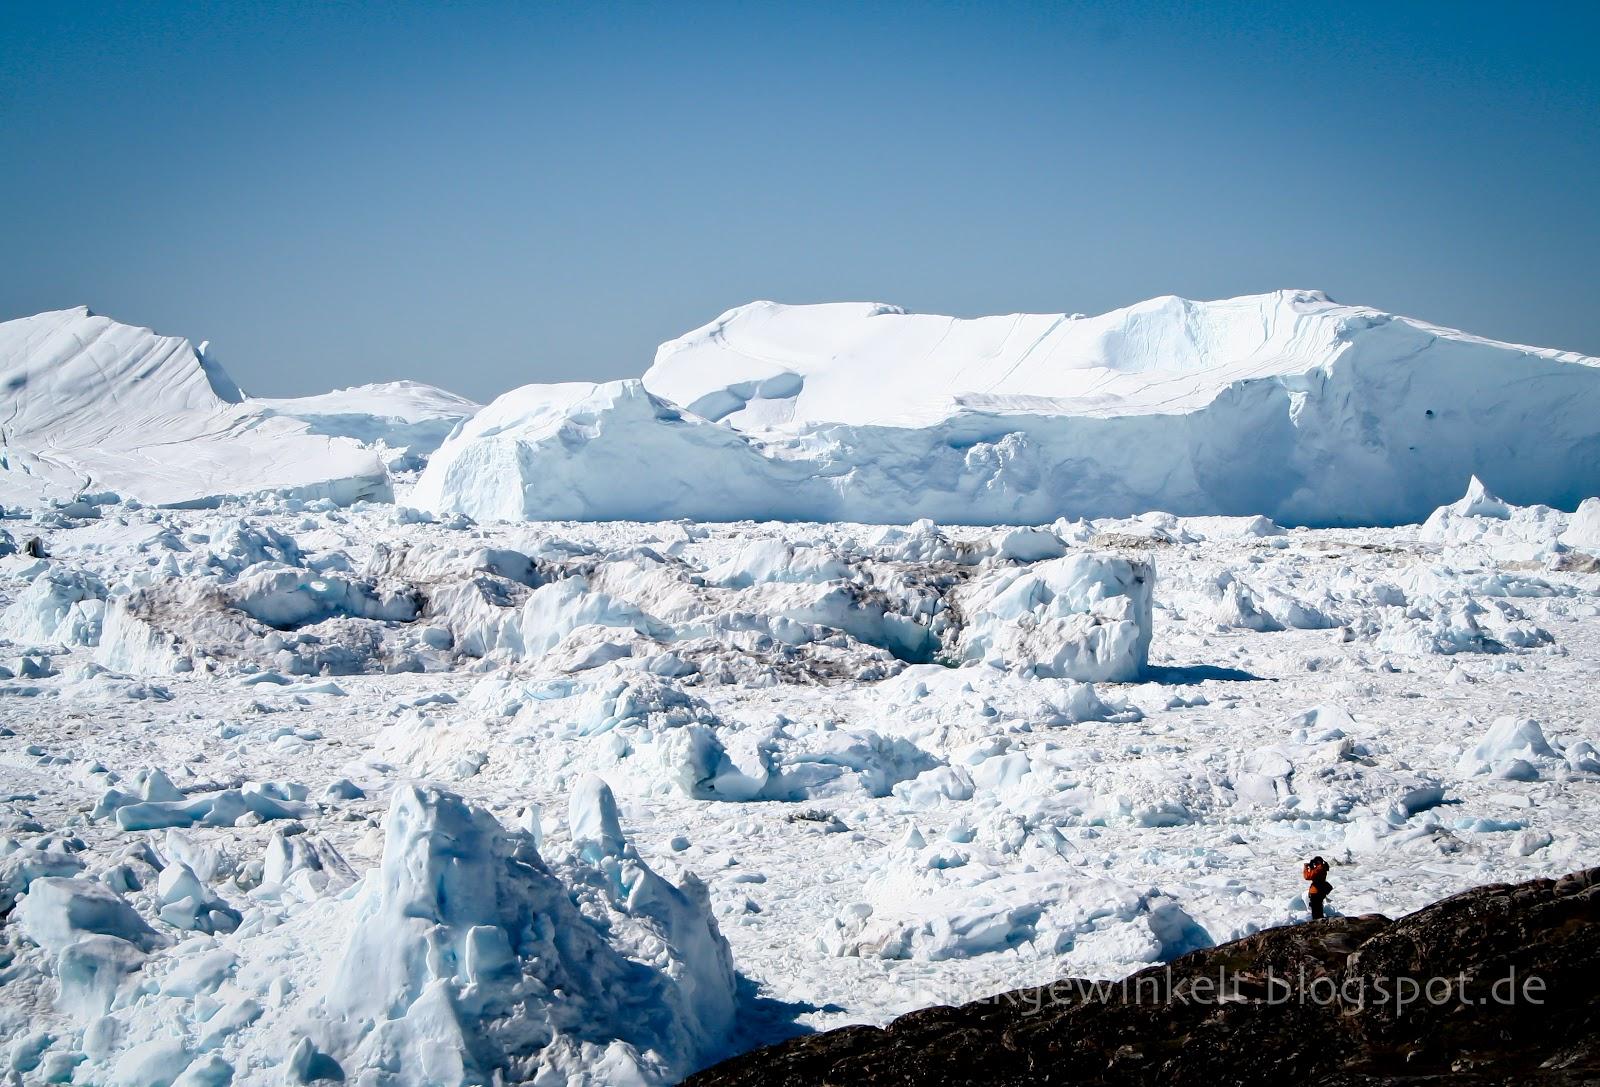 Ilullissat, Equip Sermia, Grönland